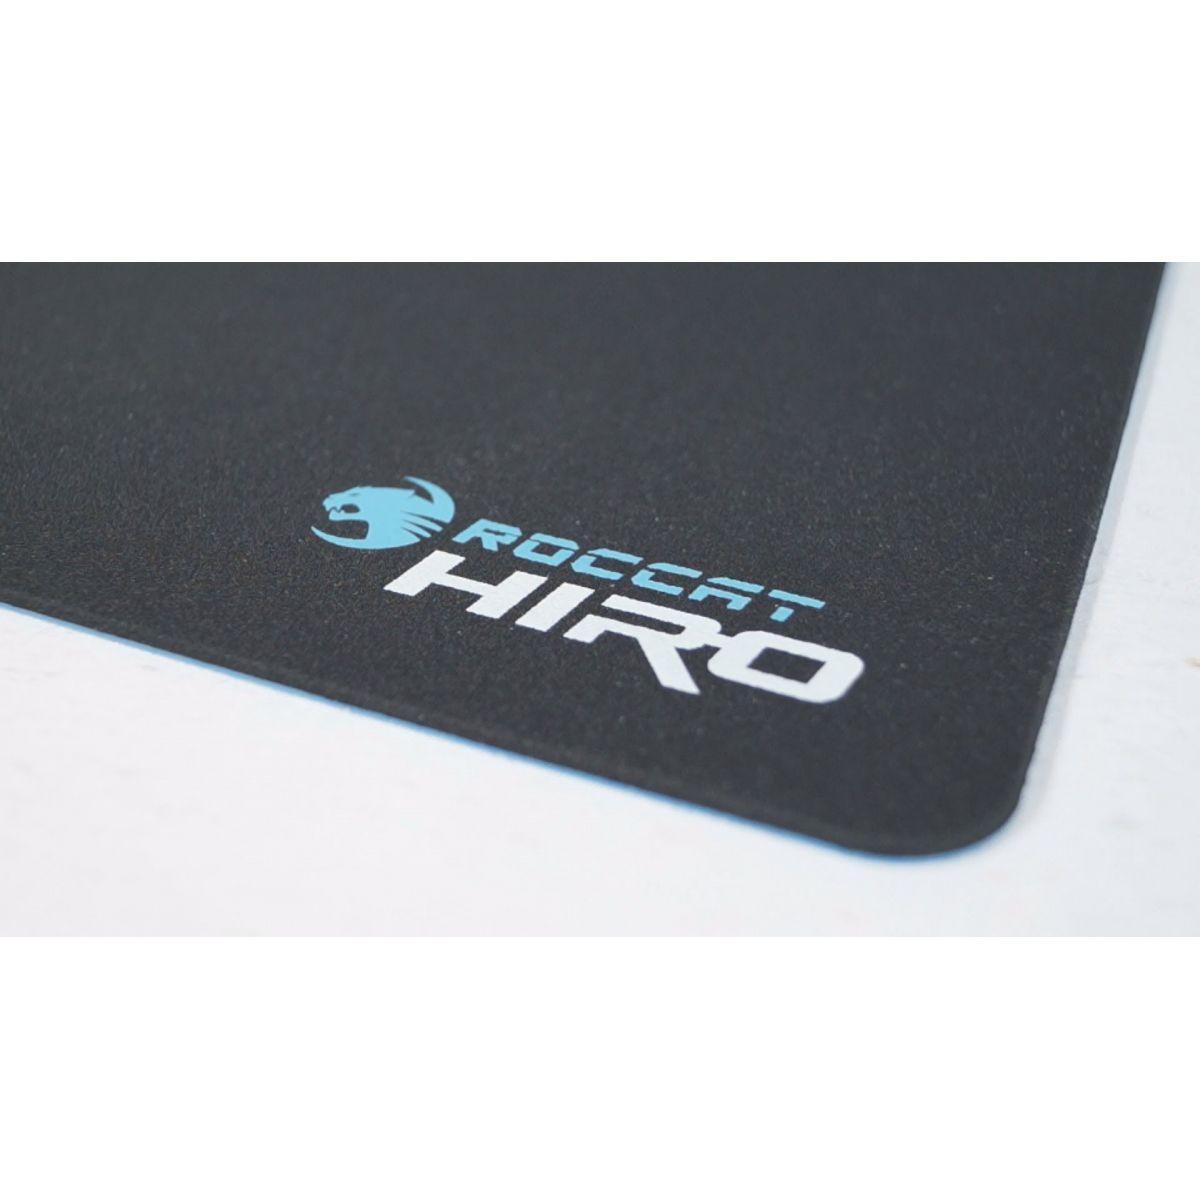 Mouse Pad Hiro Gaming Supremacy 3D ROC-13-411 - Roccat